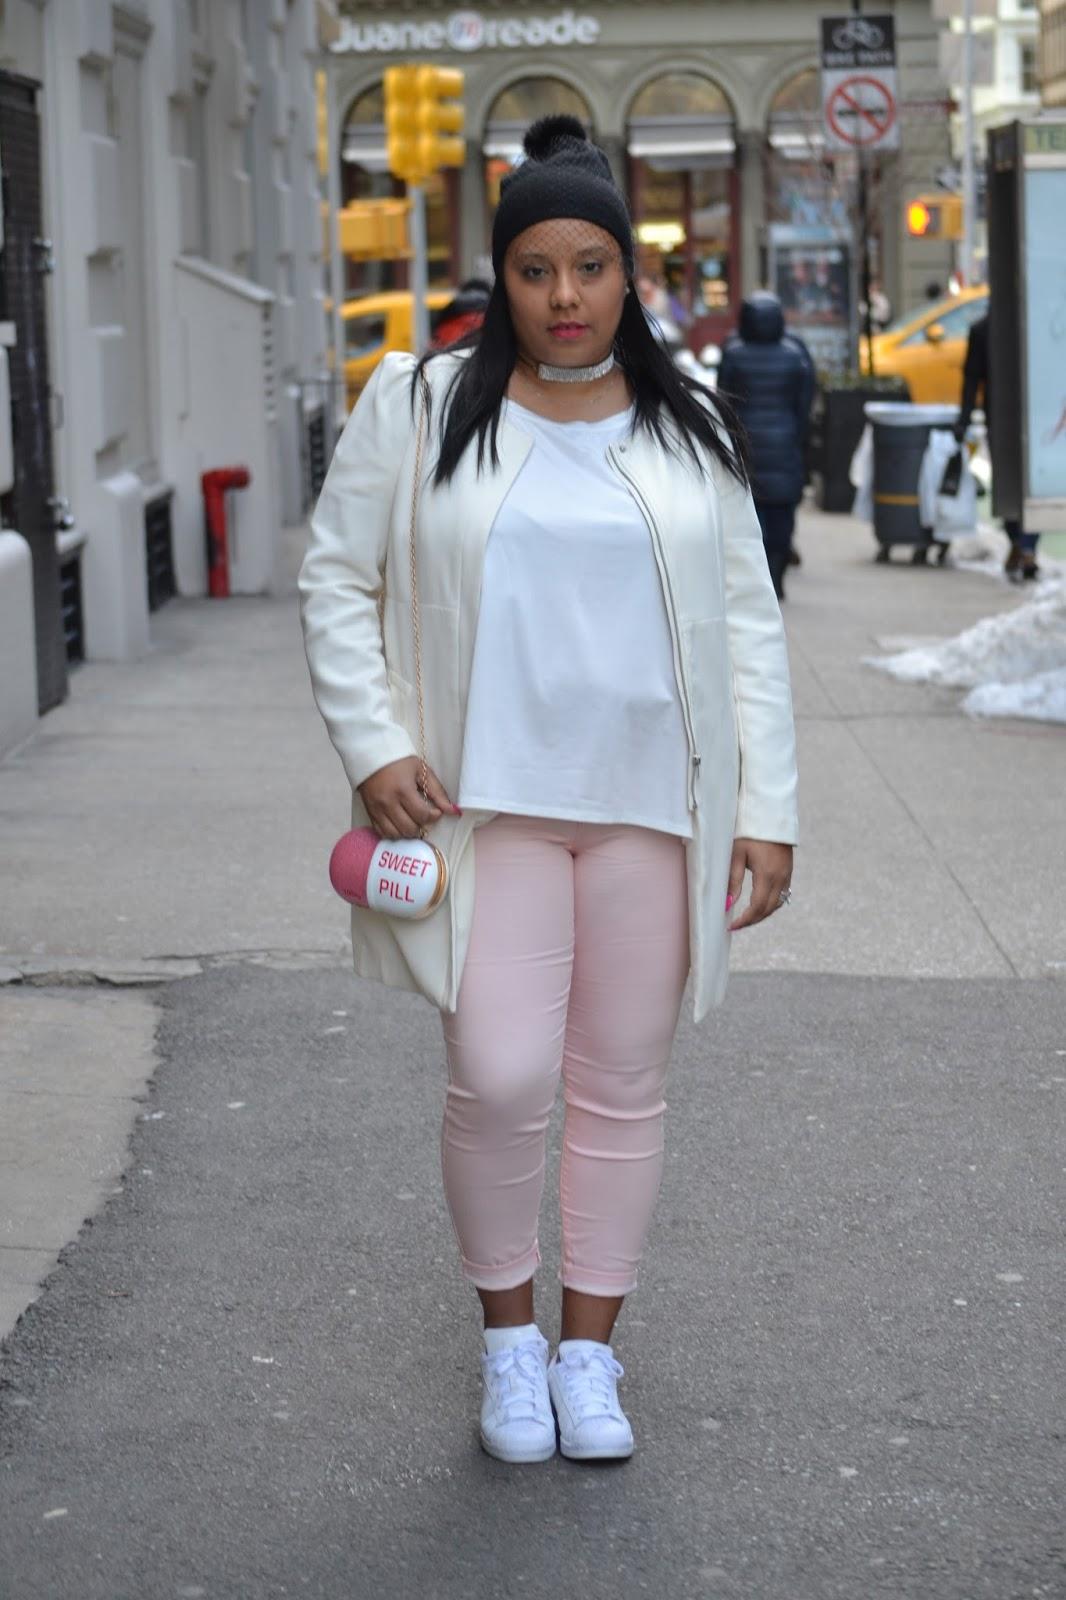 Vibrant, pink, white